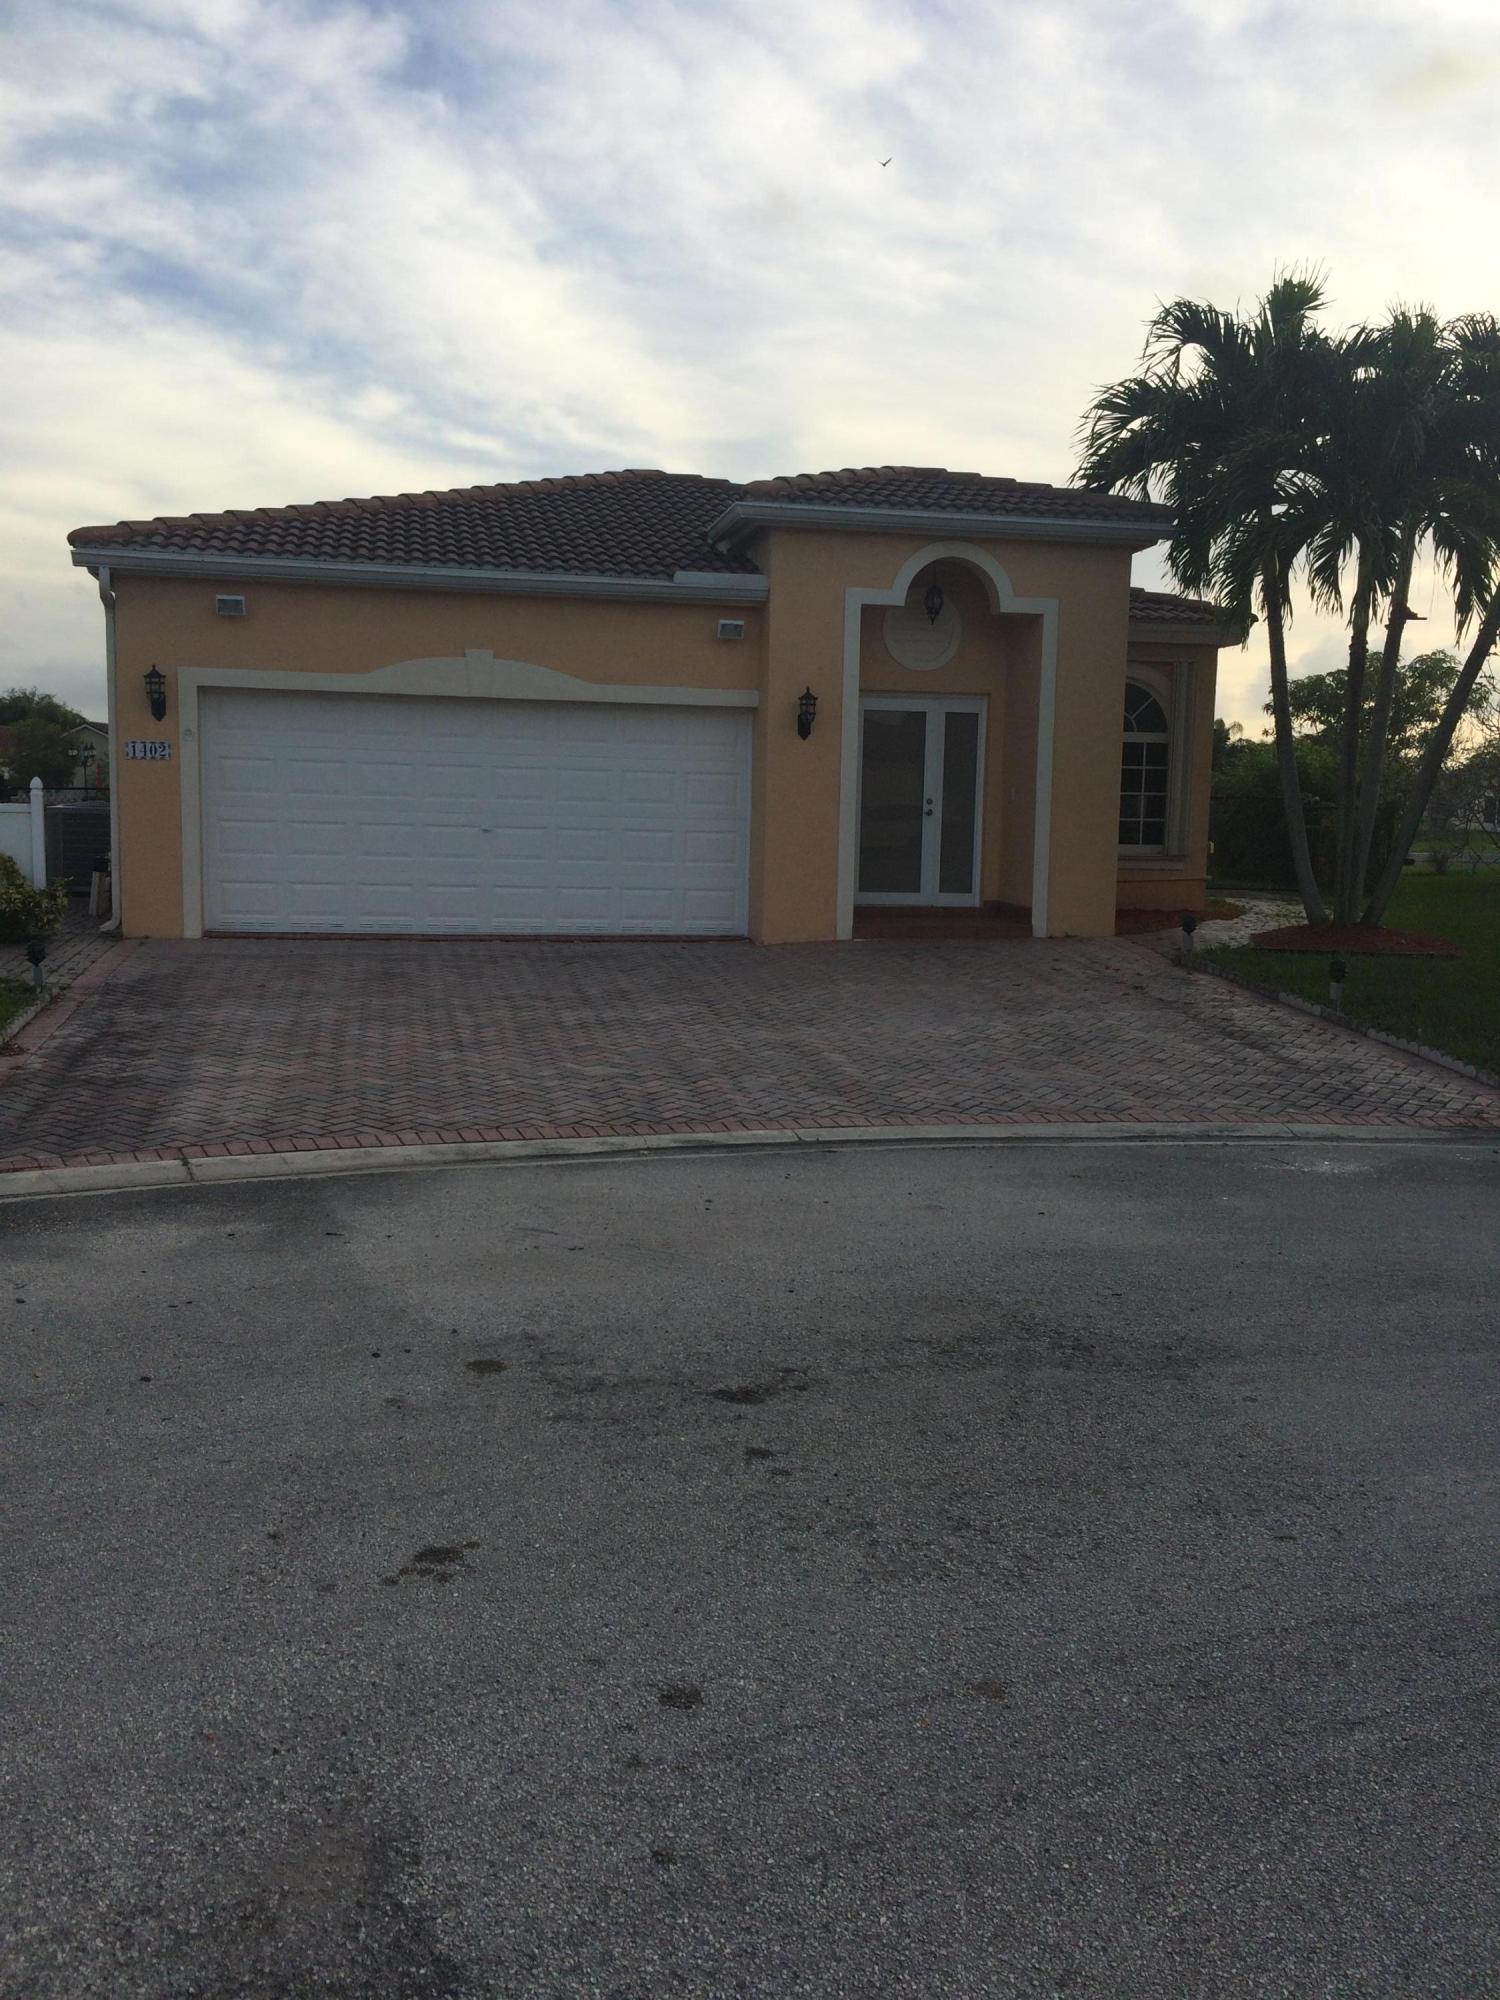 1402 45 Way, Deerfield Beach, Florida 33442, 3 Bedrooms Bedrooms, ,2 BathroomsBathrooms,Single Family,For Sale,45,RX-10495462